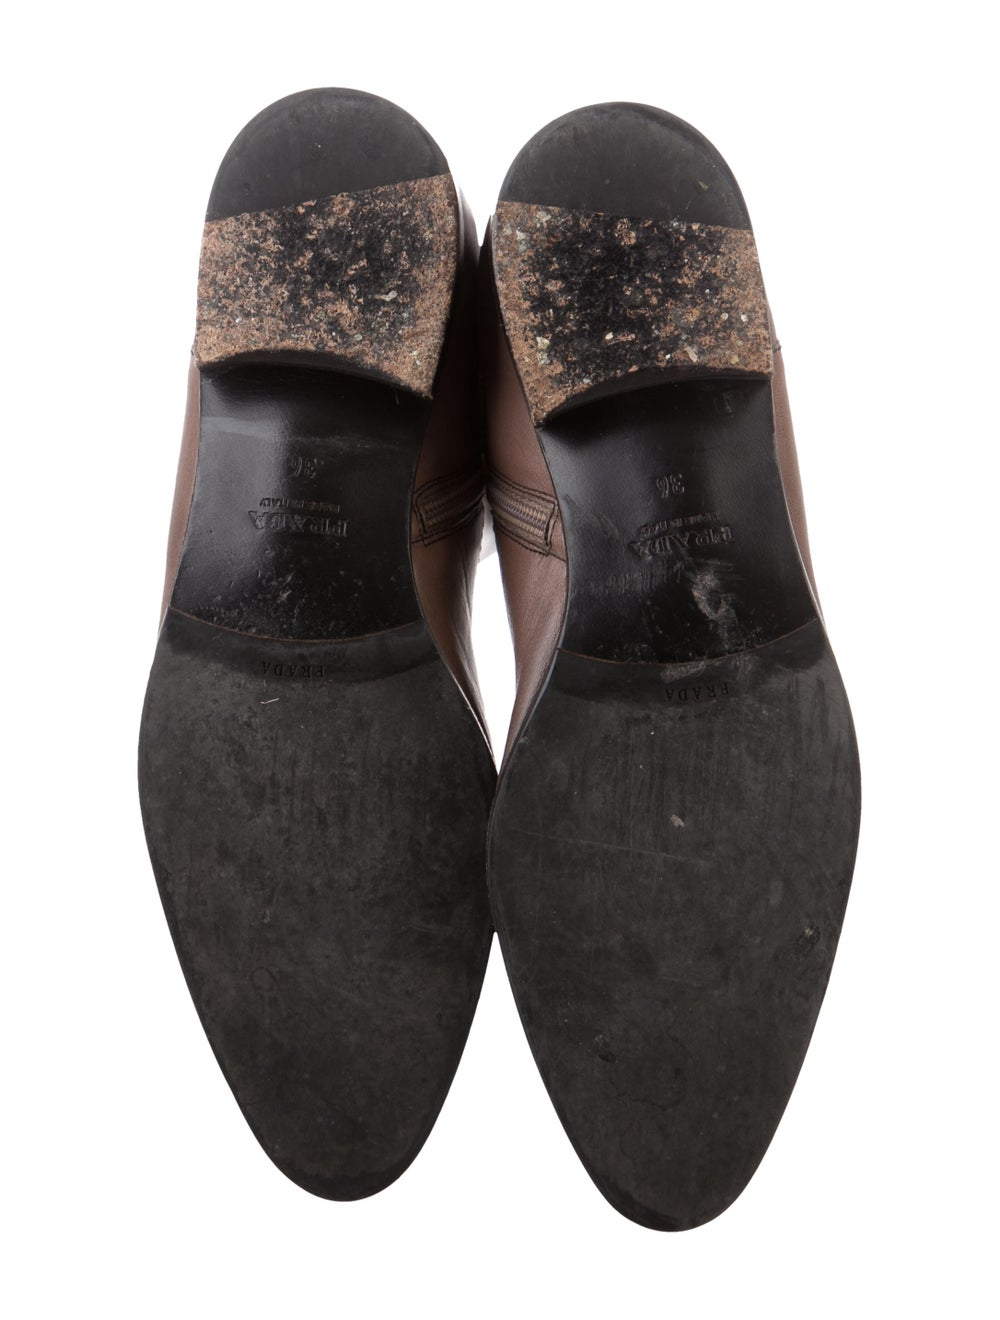 Prada Leather Knee-High Boots Brown - image 5